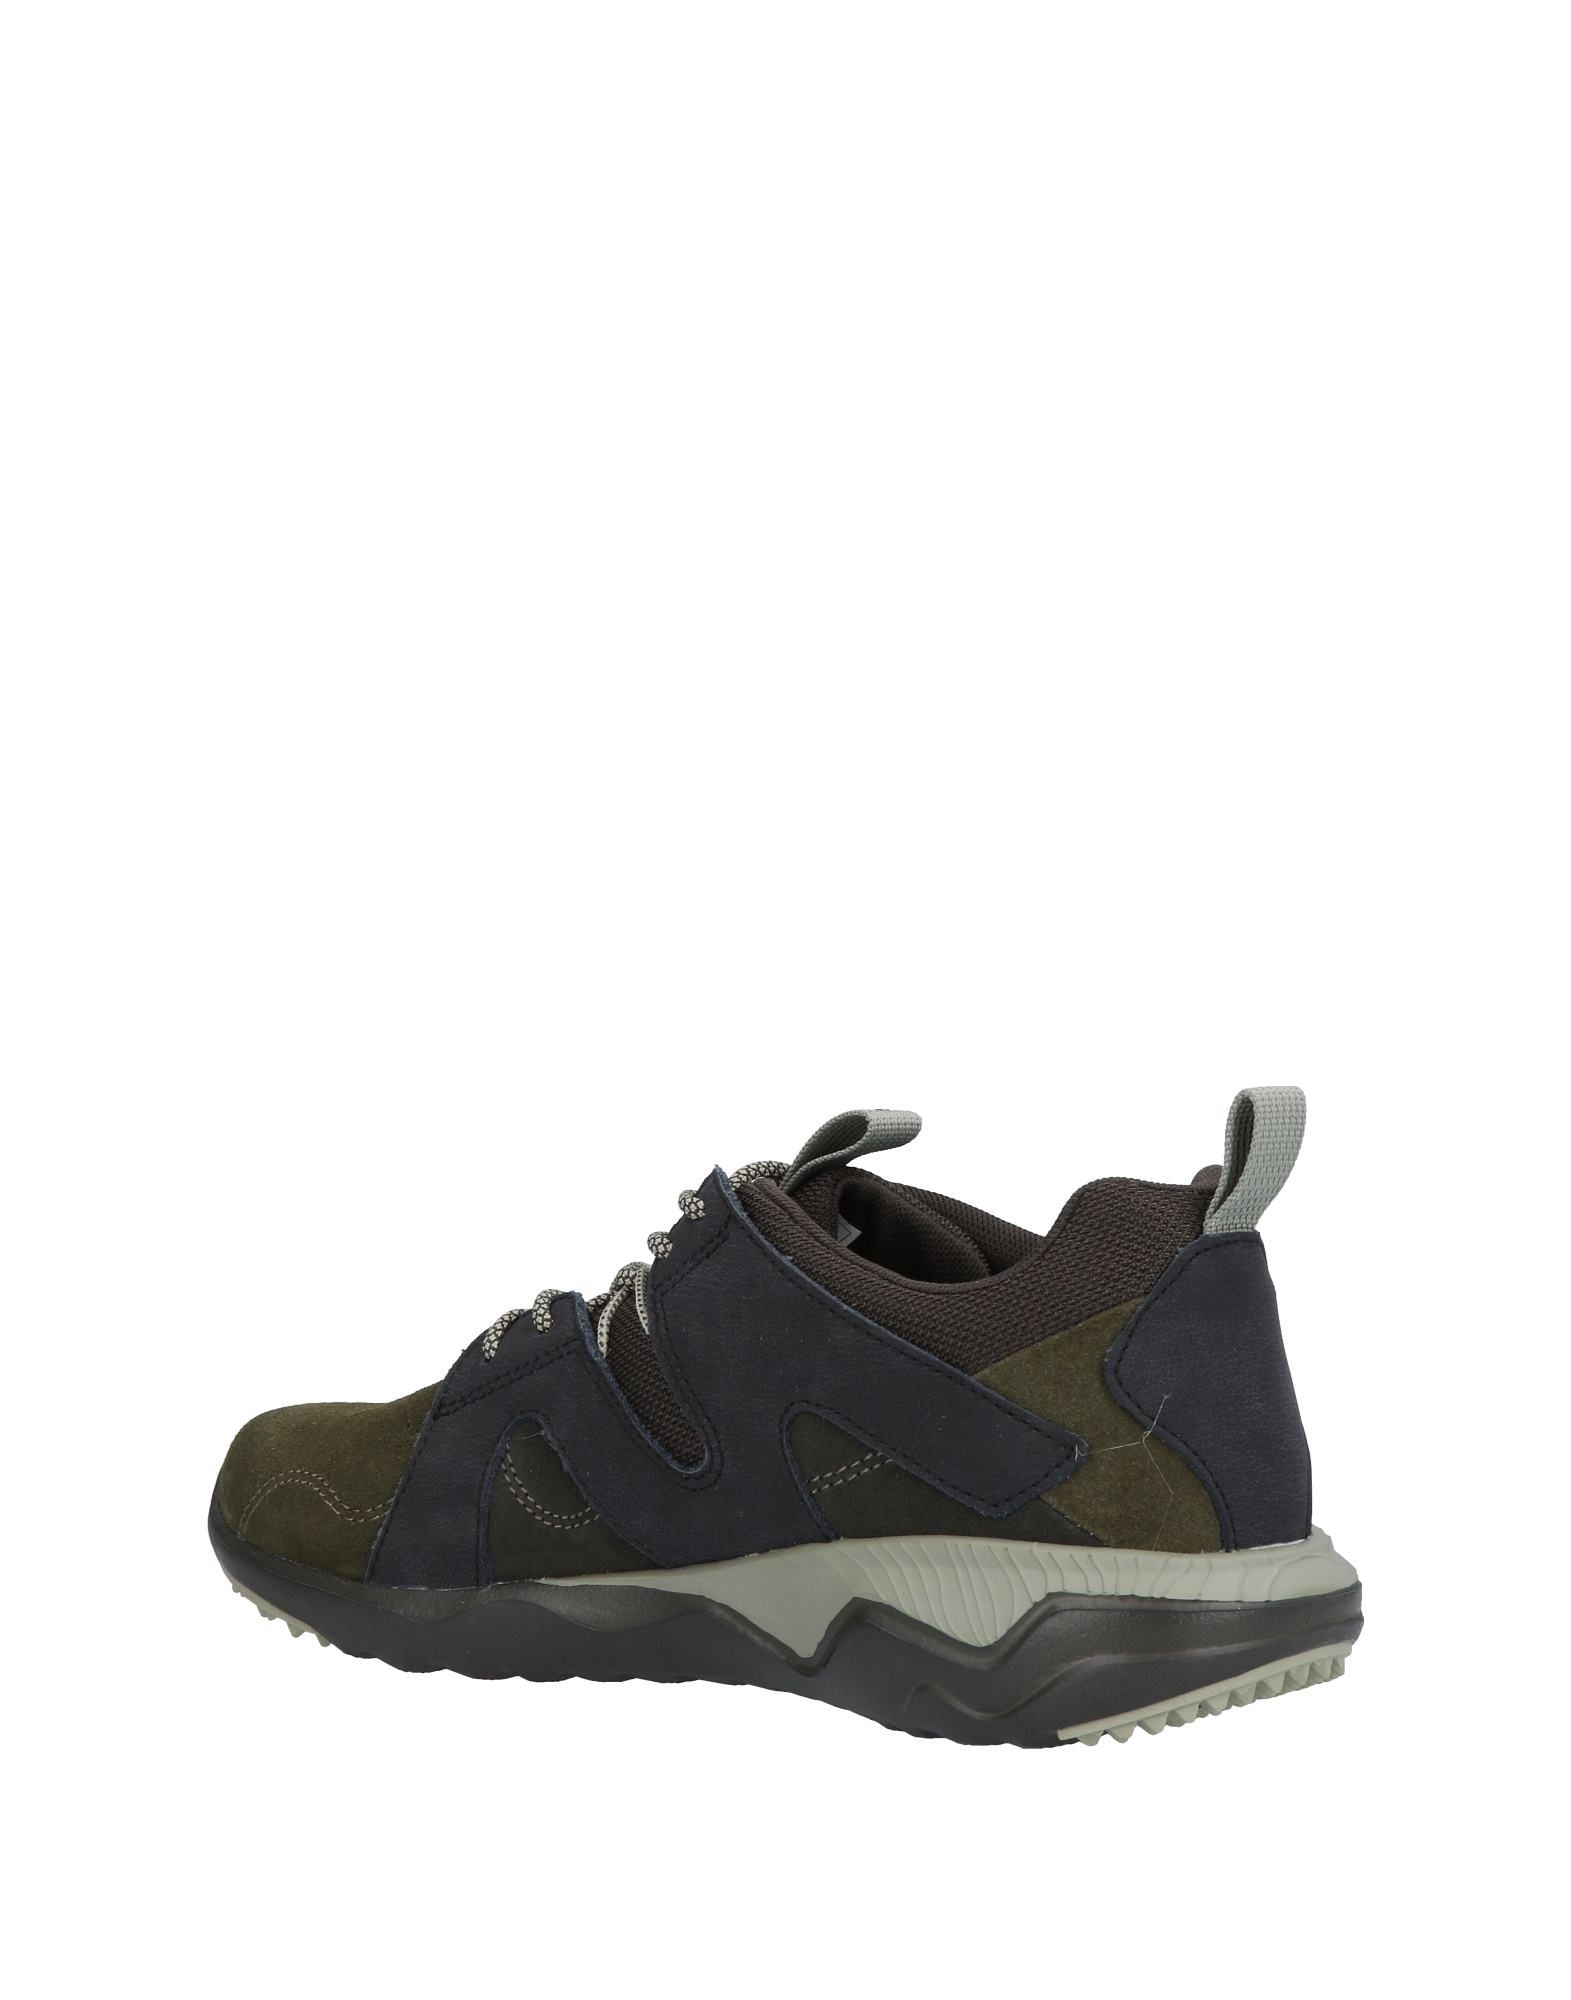 Merrell Sneakers - Men Merrell Sneakers online on    Australia - 11459041CI 52790d